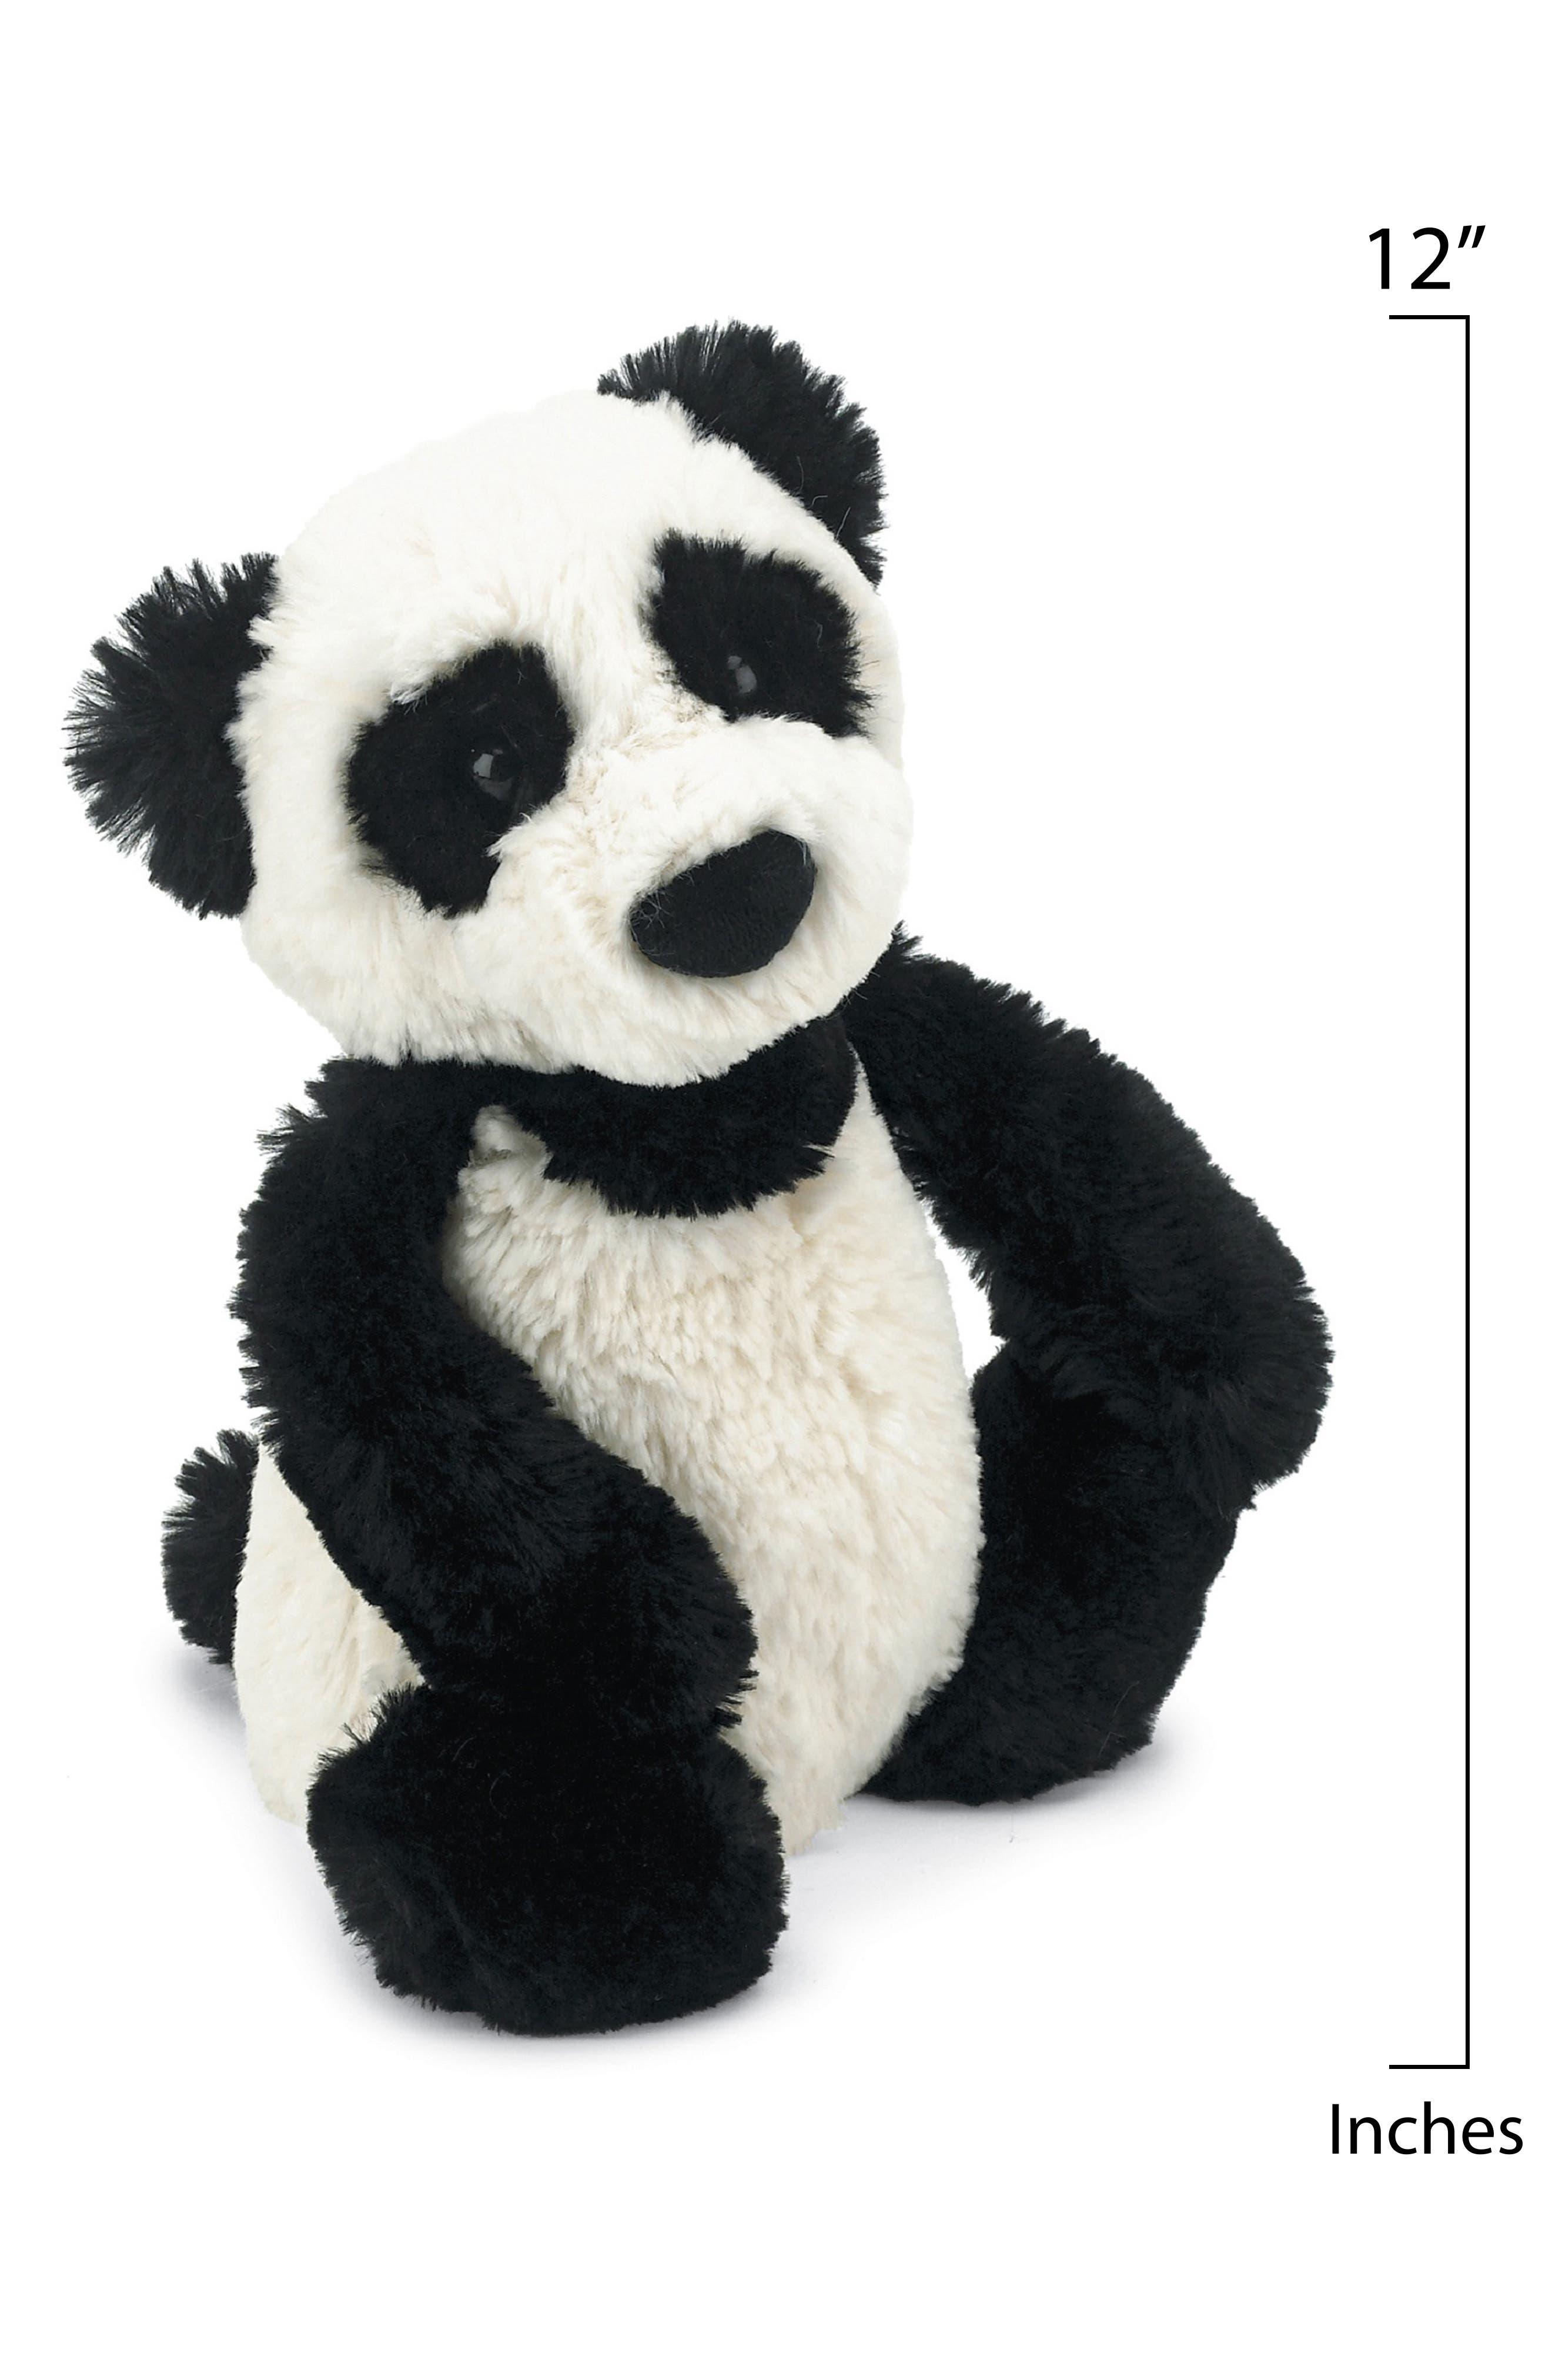 'Medium Bashful Panda' Stuffed Animal,                             Alternate thumbnail 2, color,